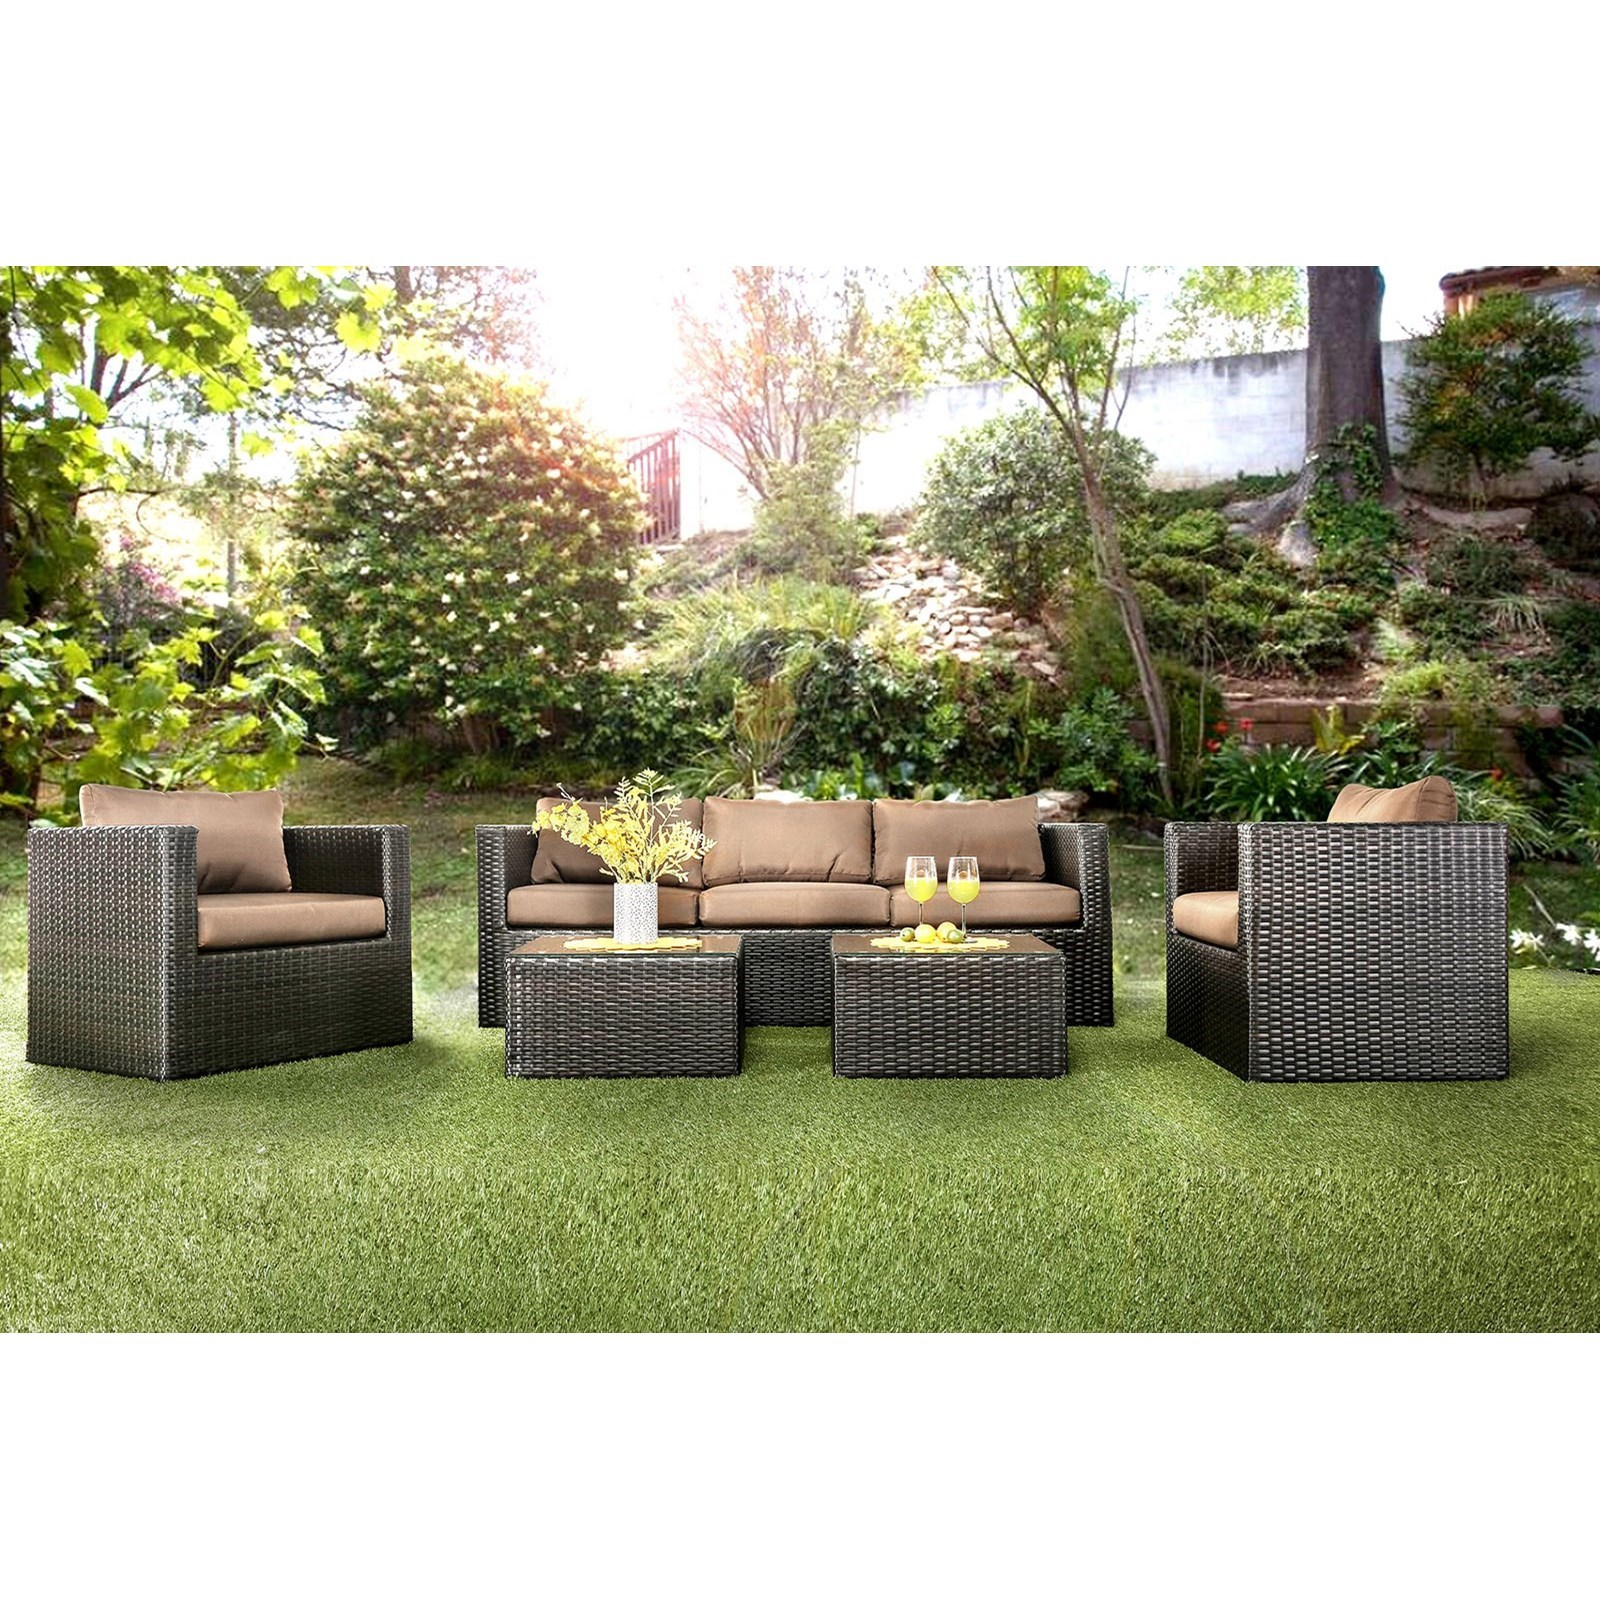 Olina 5 Pc. Patio Set at Household Furniture